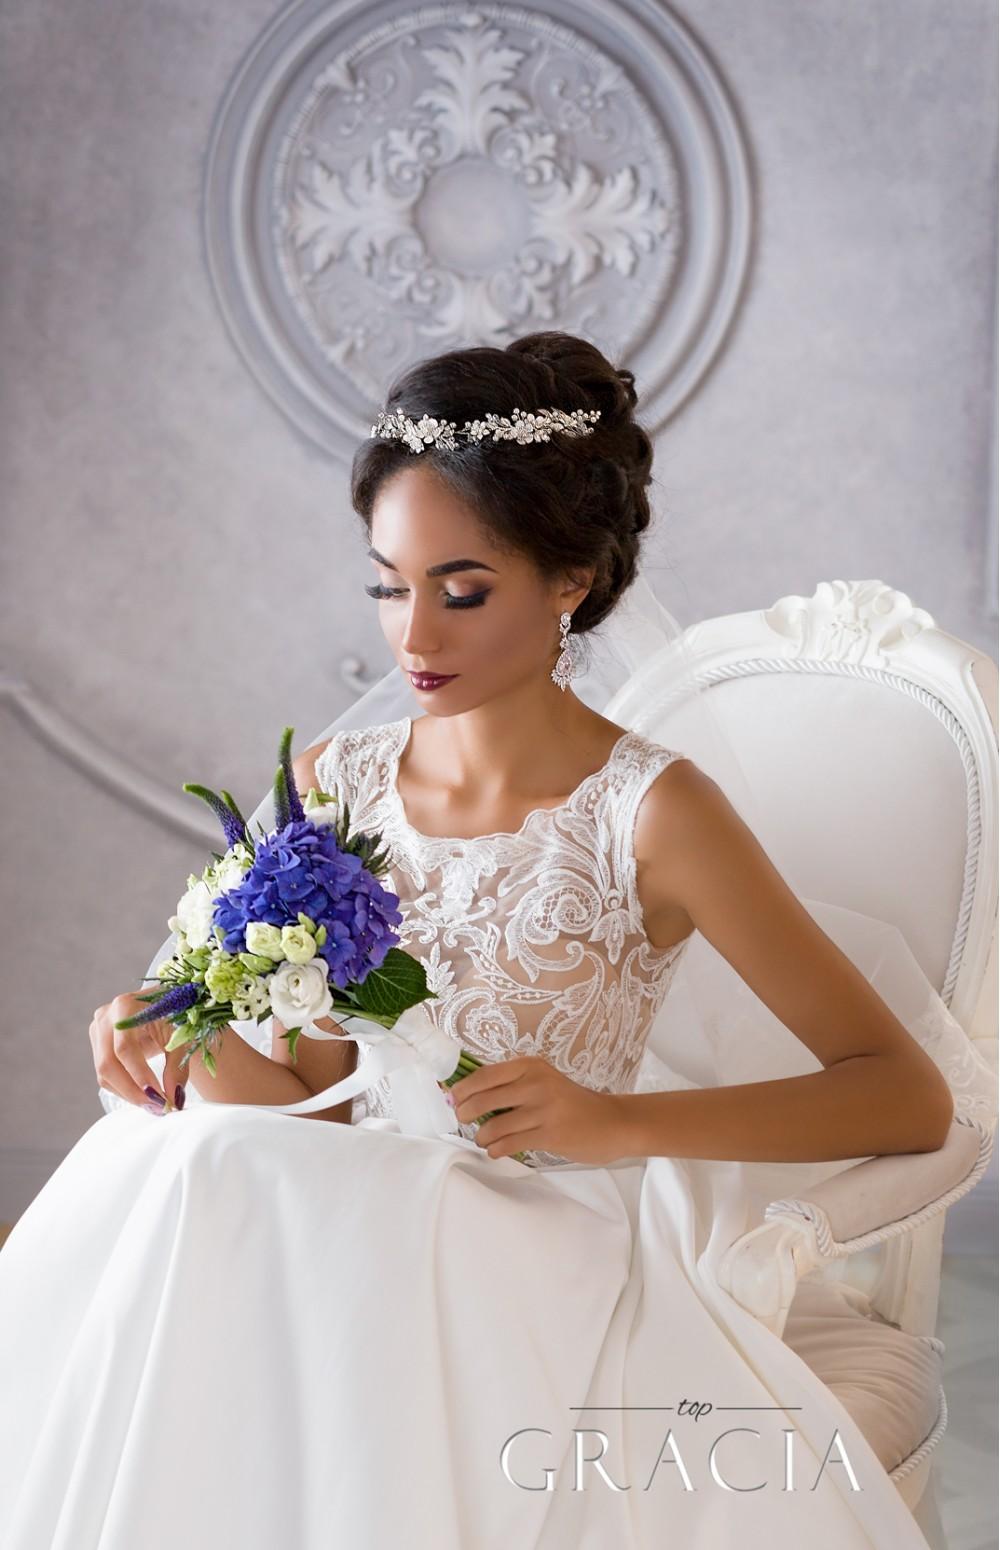 Dorcia White Silver Wedding Bridal Flower Crown By Topgracia